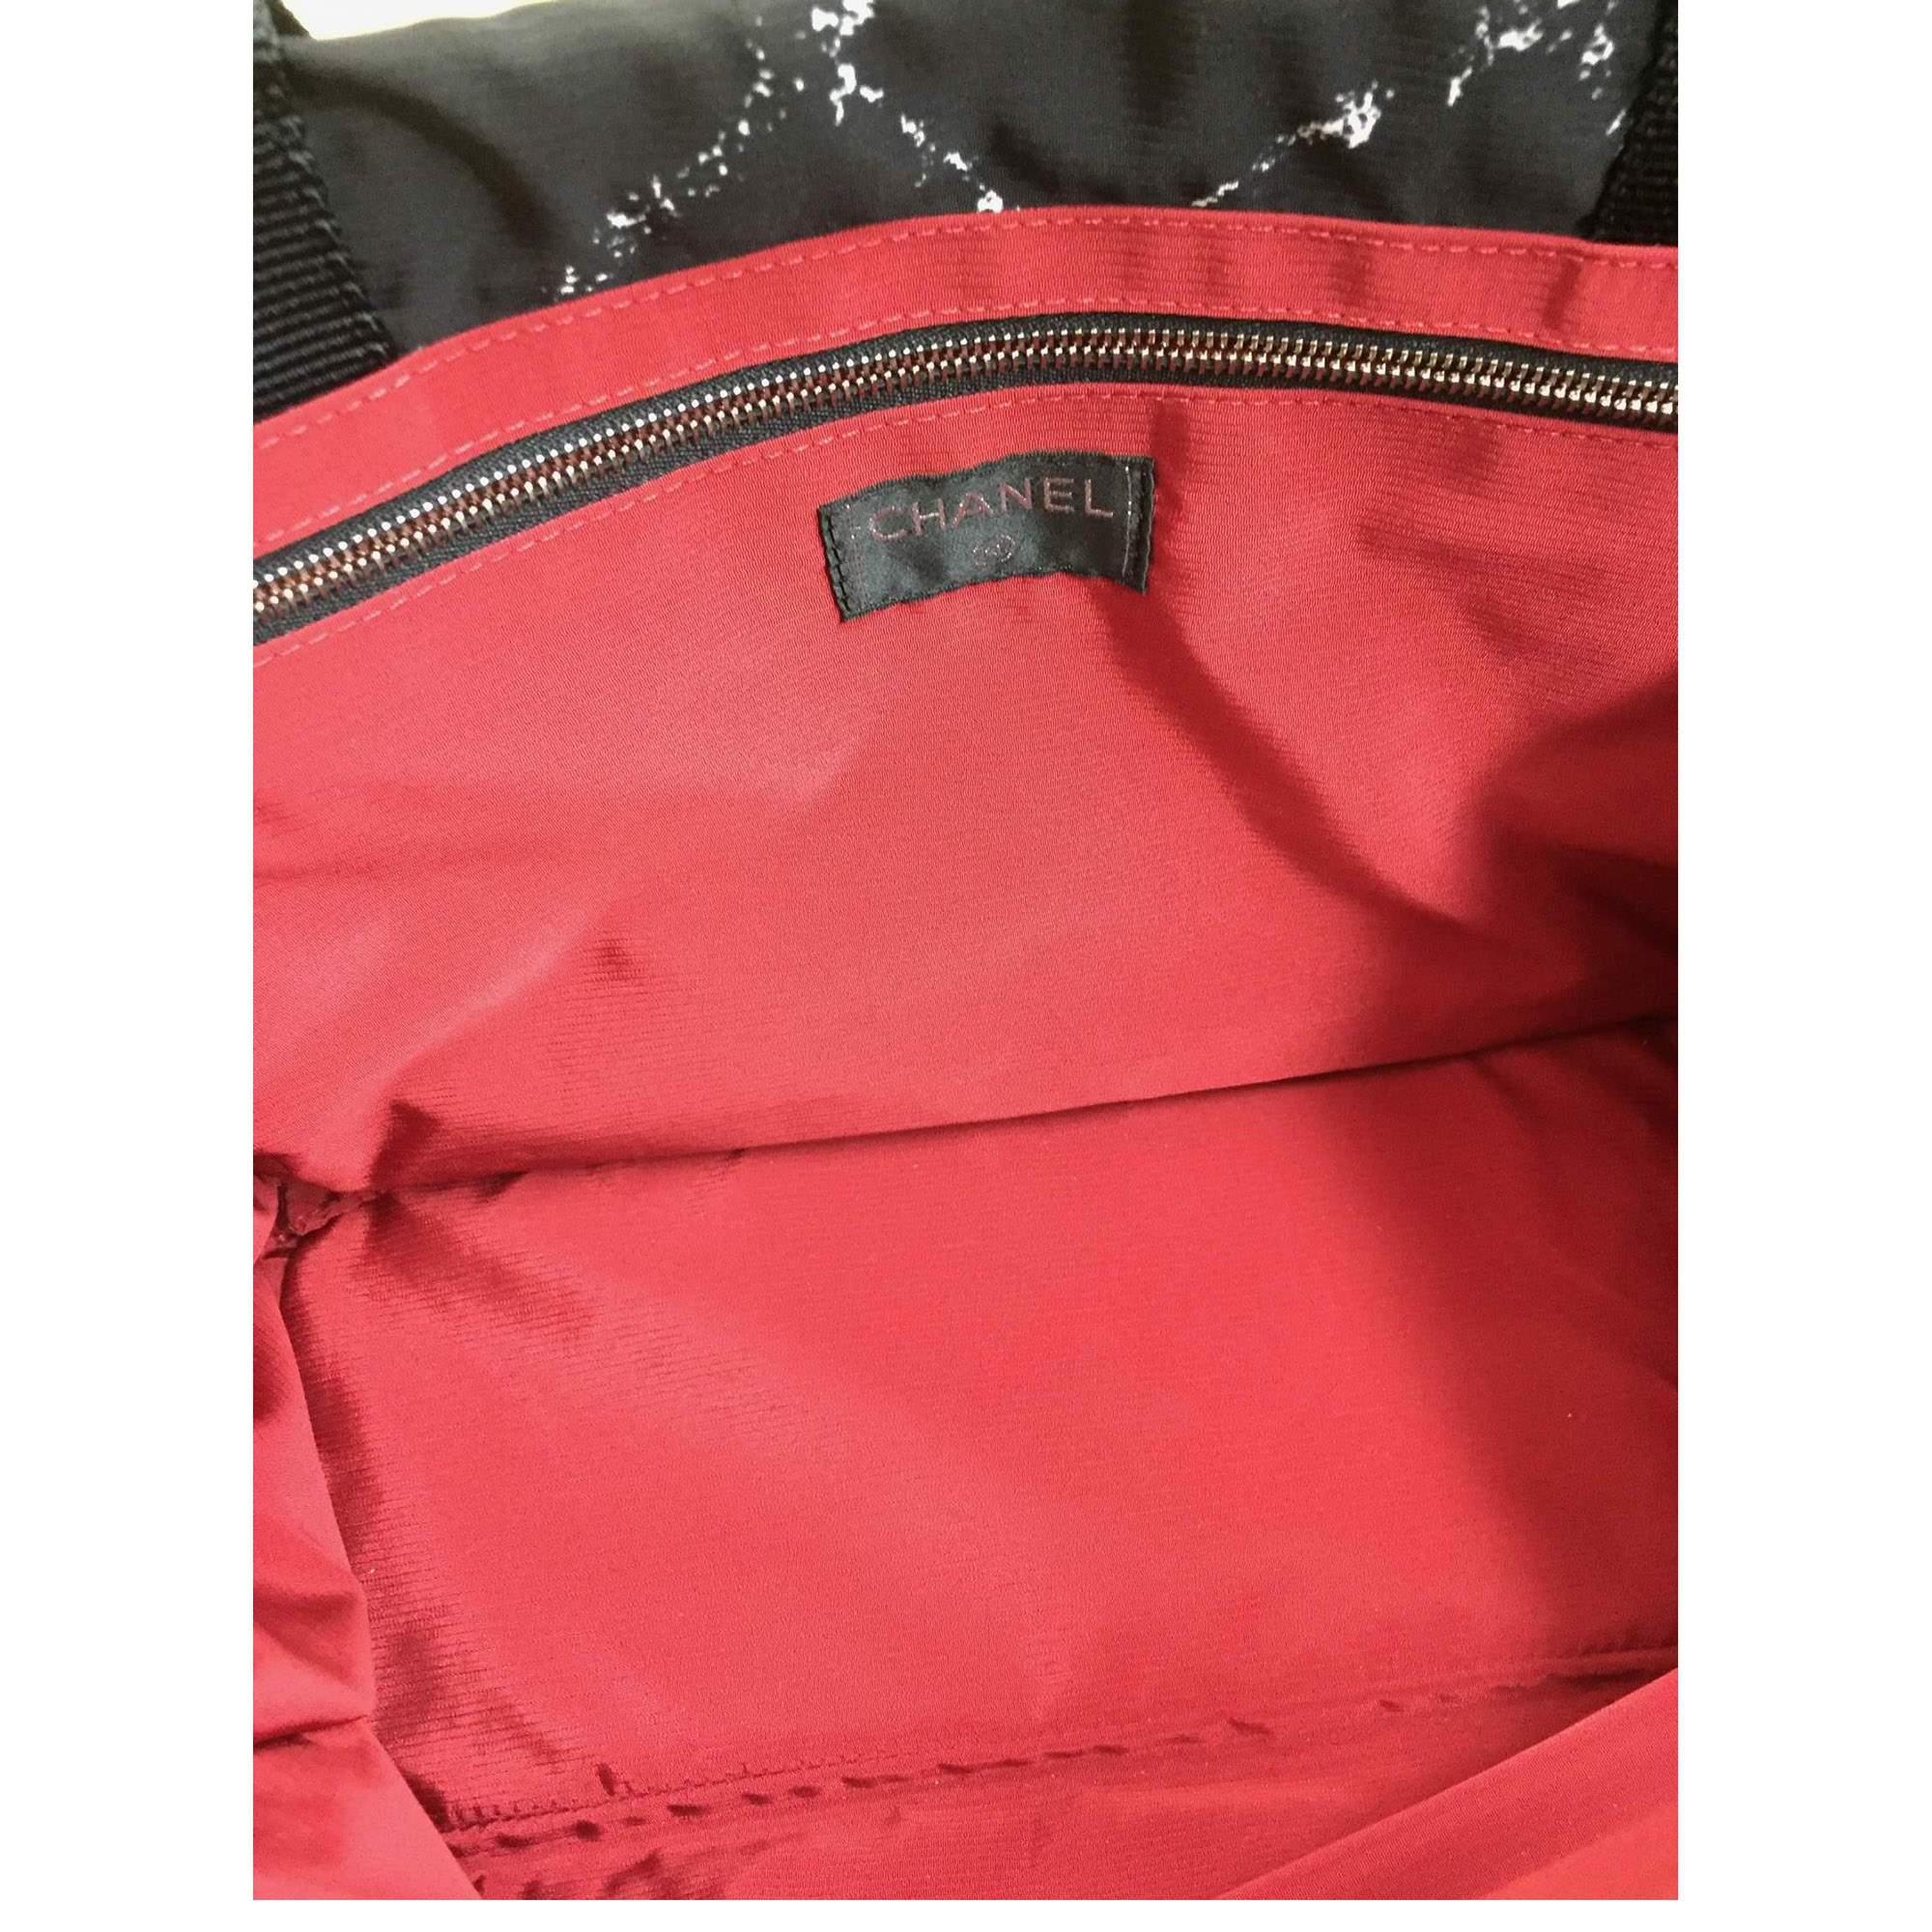 1405a76de1affa Chanel Black waterproof canvas tote Bag | The Chic Selection